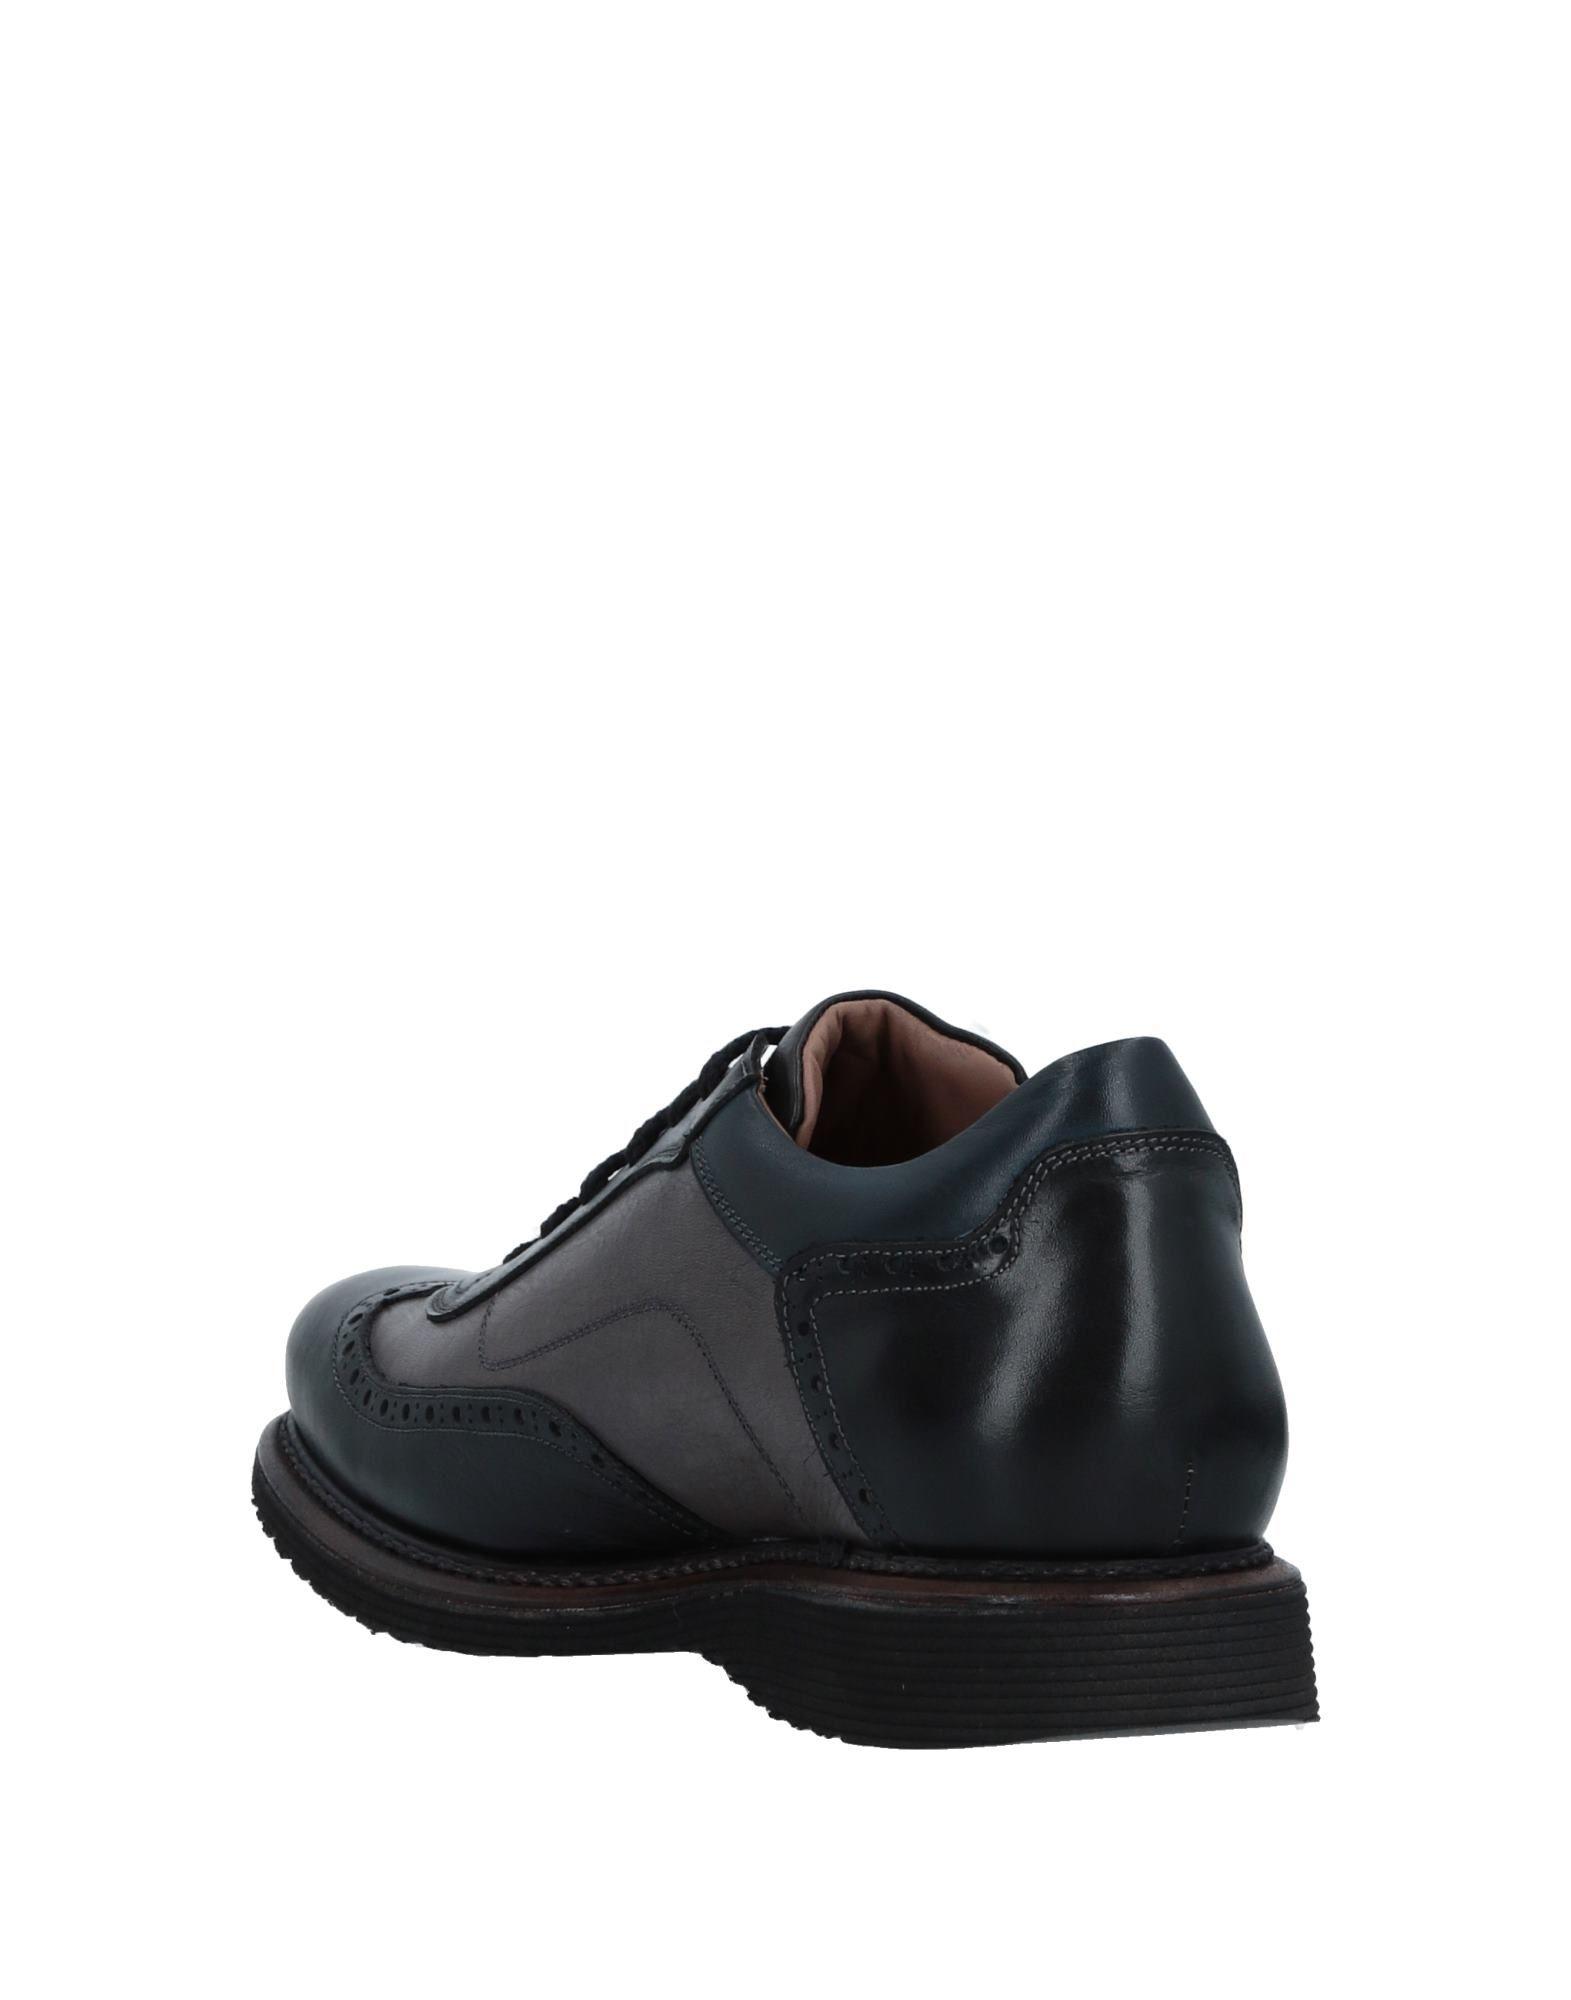 Trofeo By Stefano Branchini Sneakers Herren  Schuhe 11521472VS Gute Qualität beliebte Schuhe  c78bd2